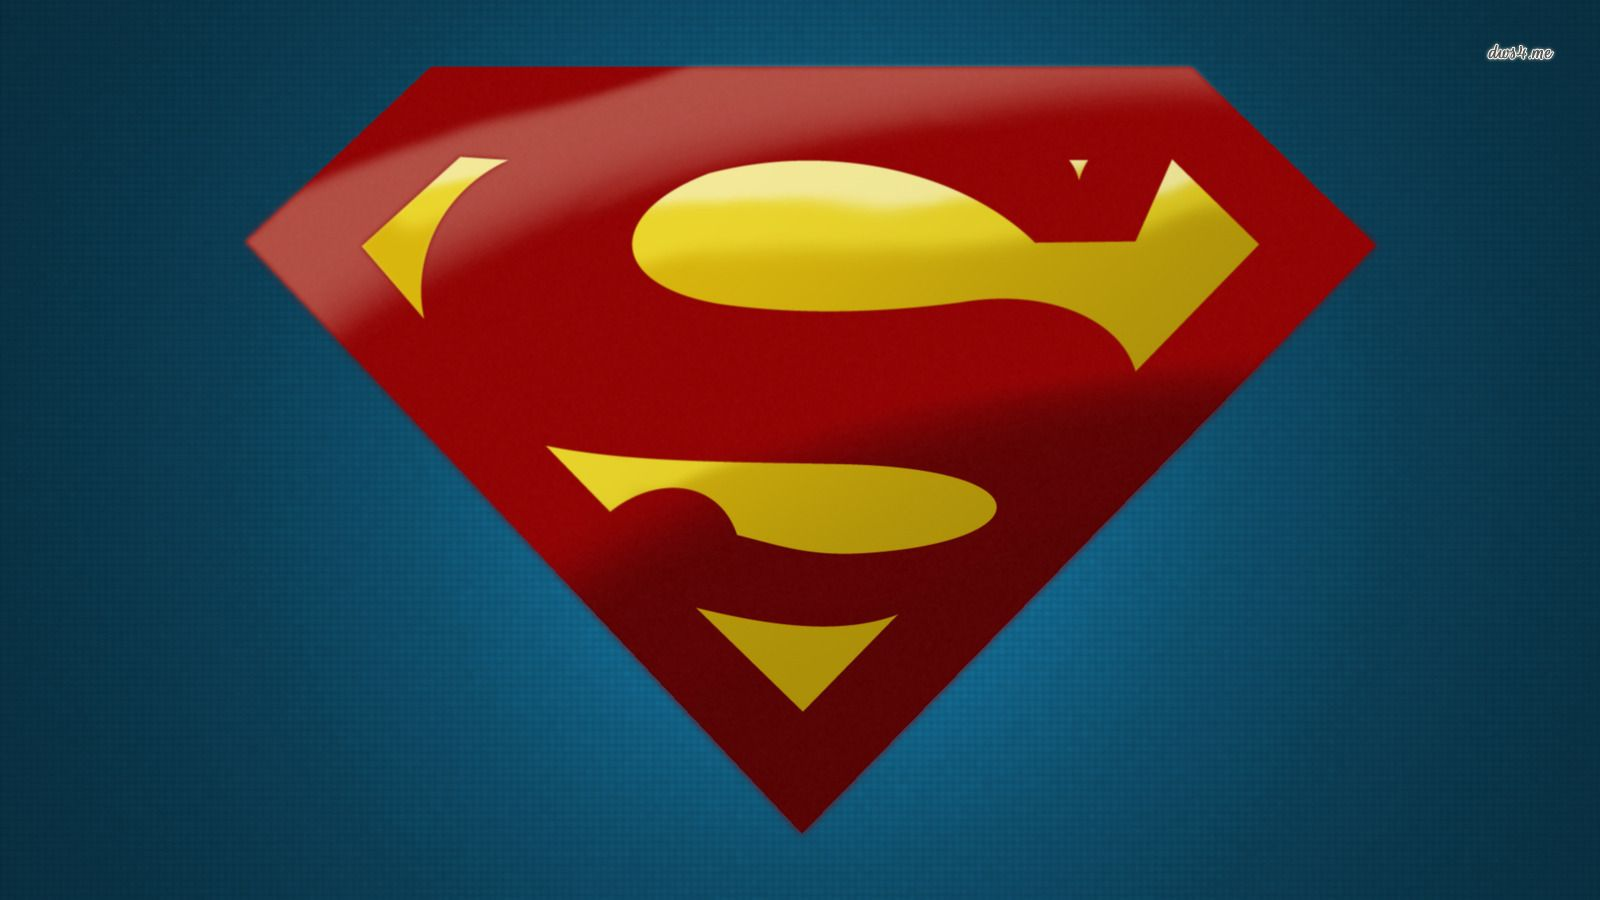 Superman Logo Superman Logo Movie Wallpaper With 1600x900 Resolution Superman Wallpaper Superman Pictures Man Wallpaper